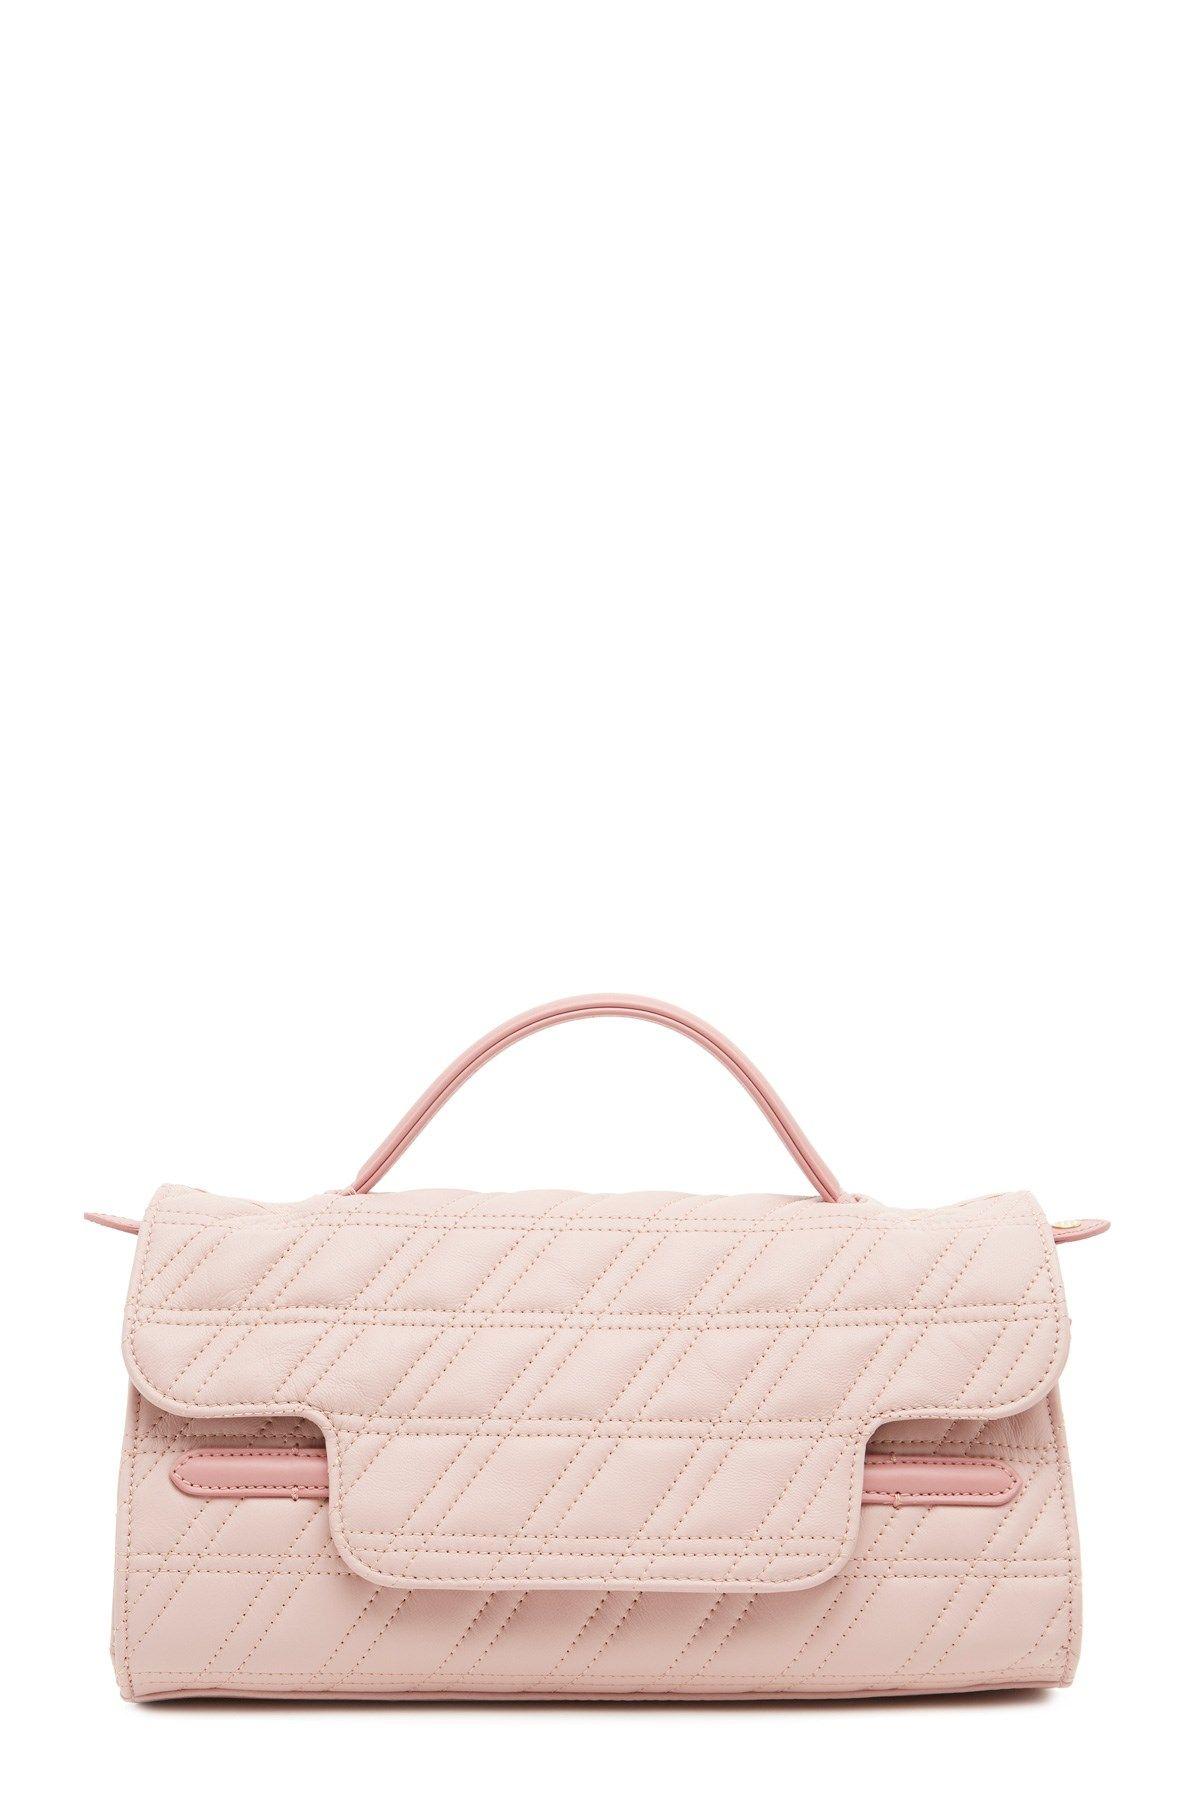 Zanellato Nina S Zeta Pink Matelasse Leather Bag